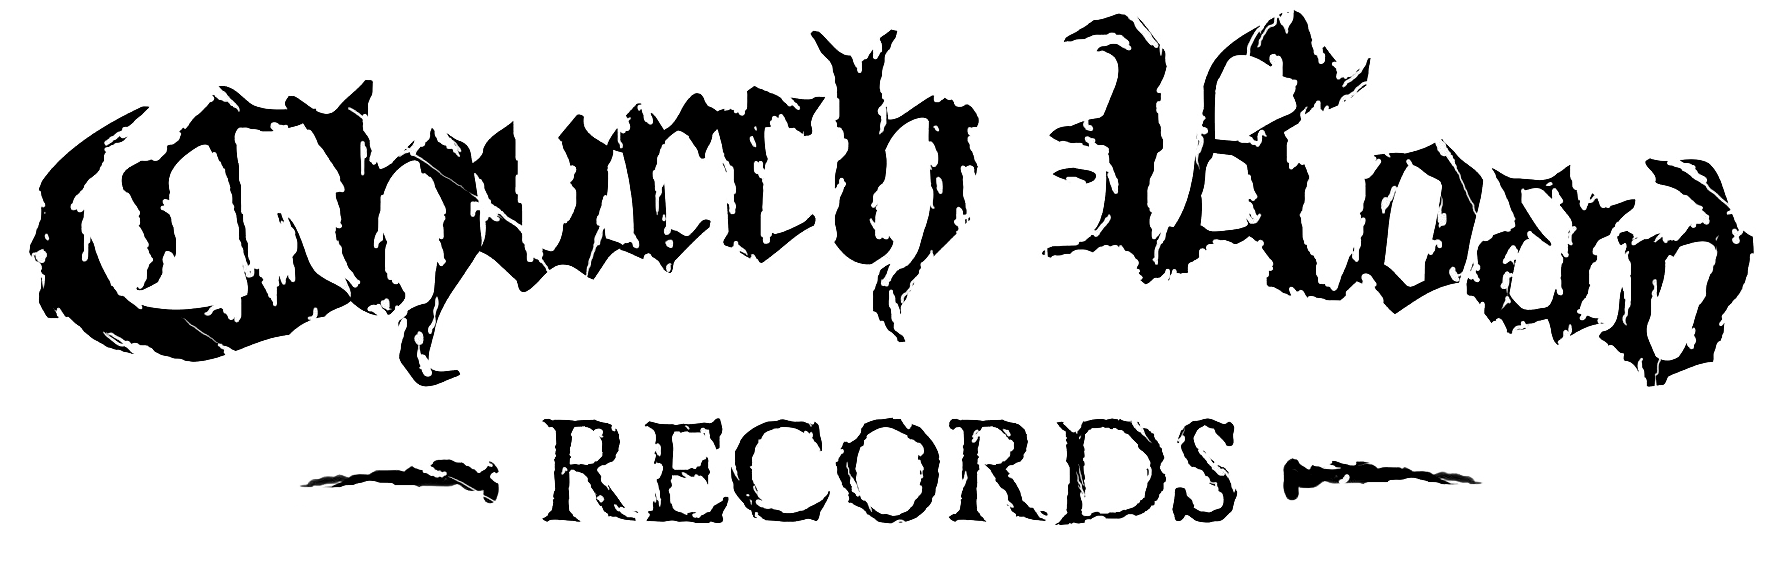 Church Road Records